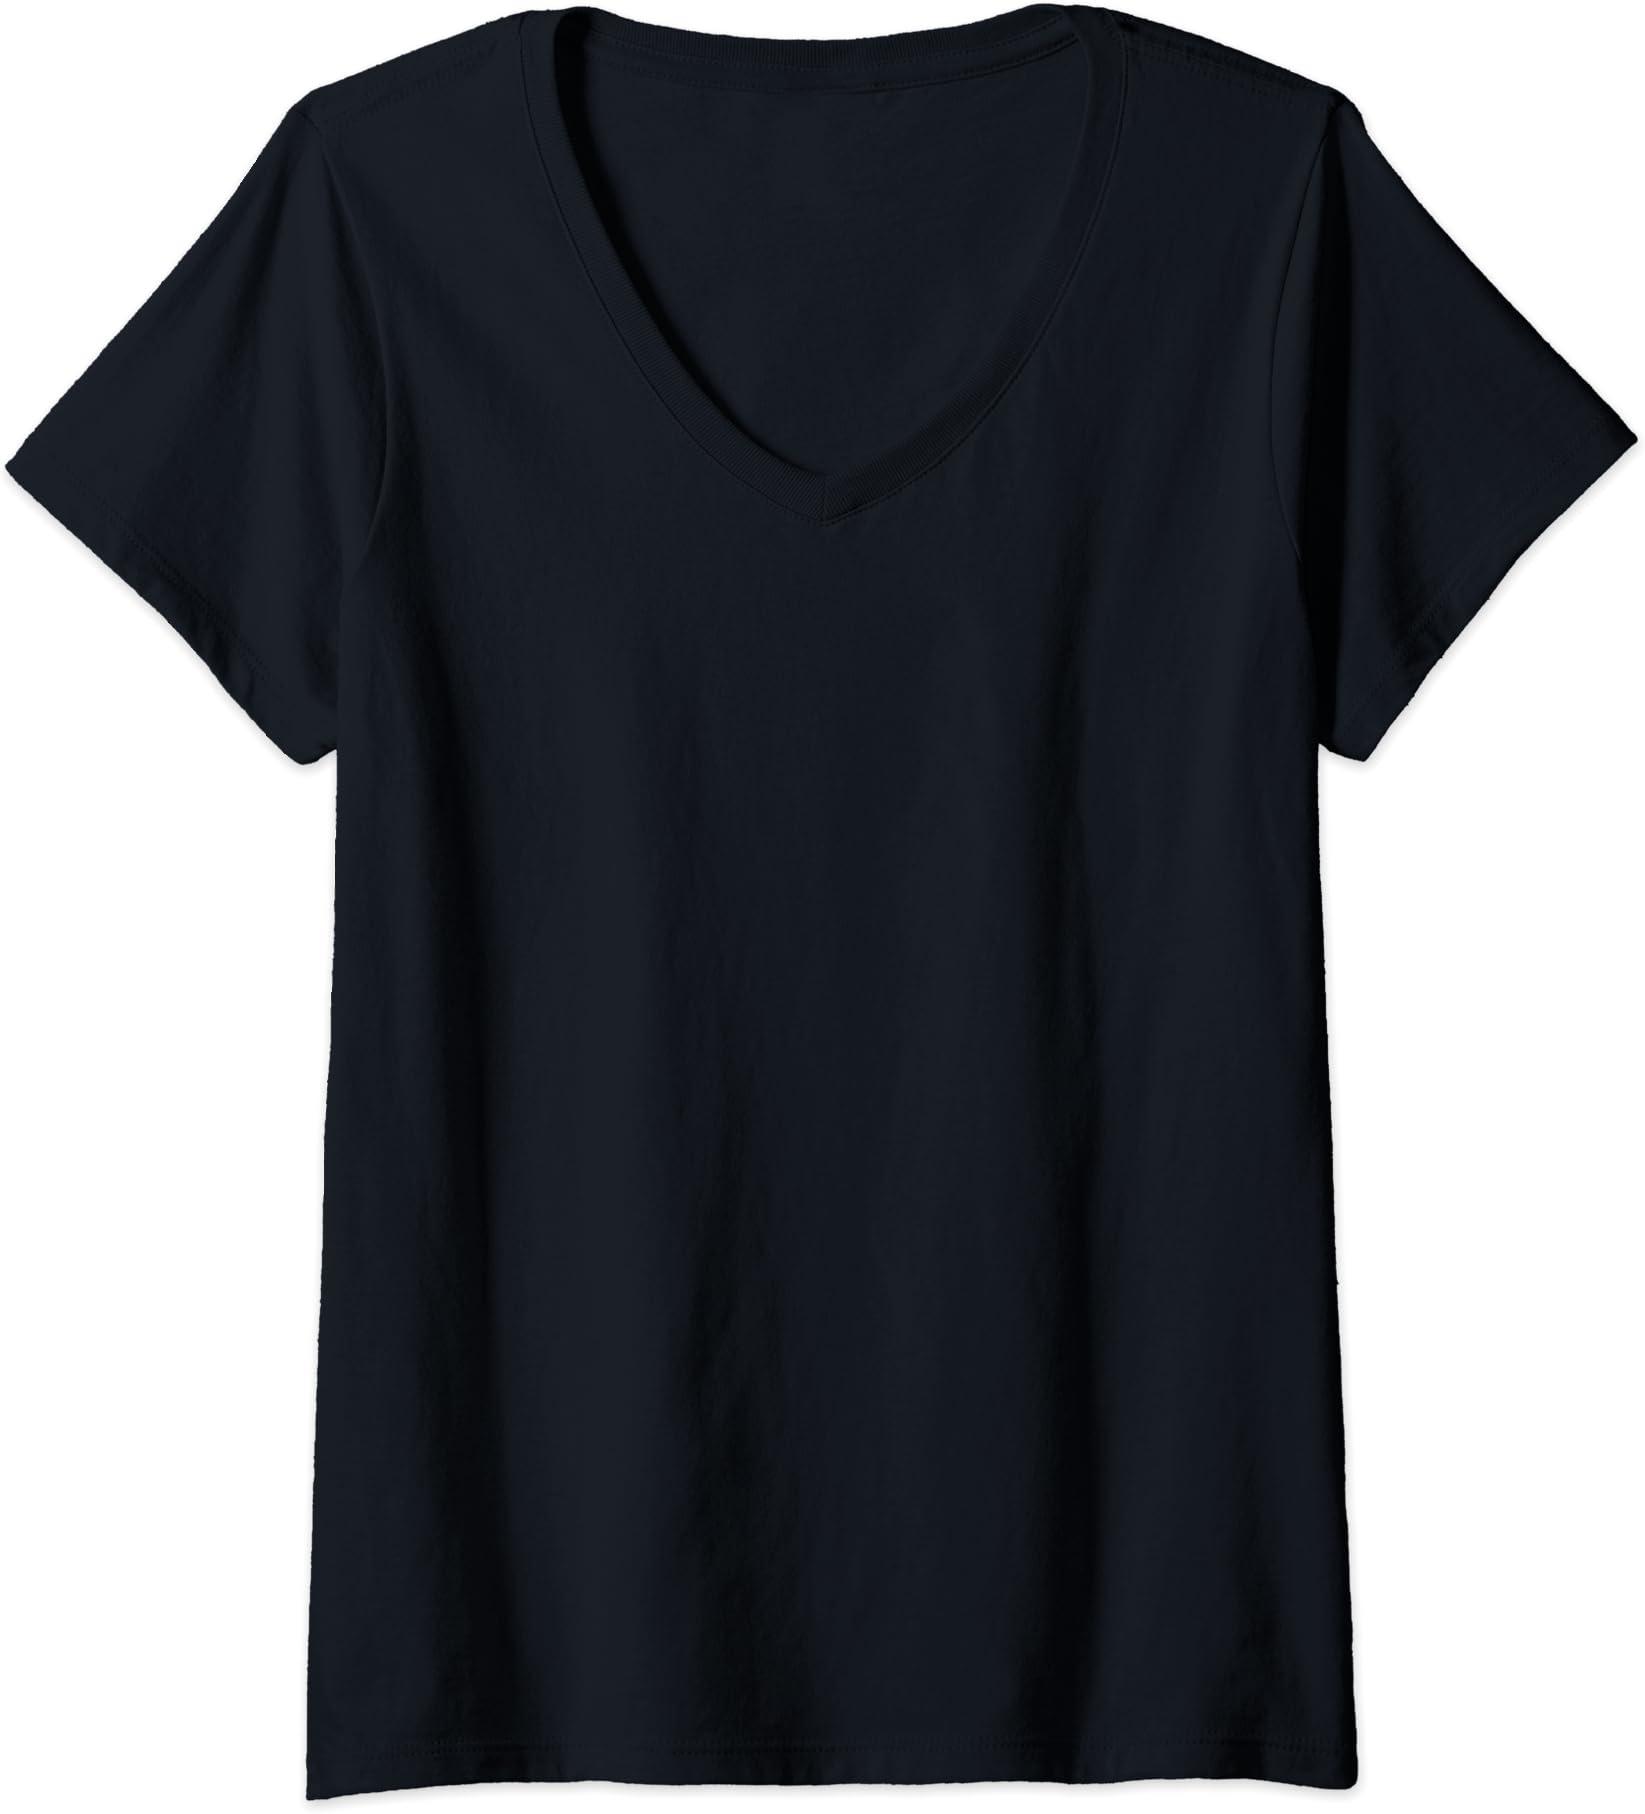 Antigua text V-Neck T-Shirt